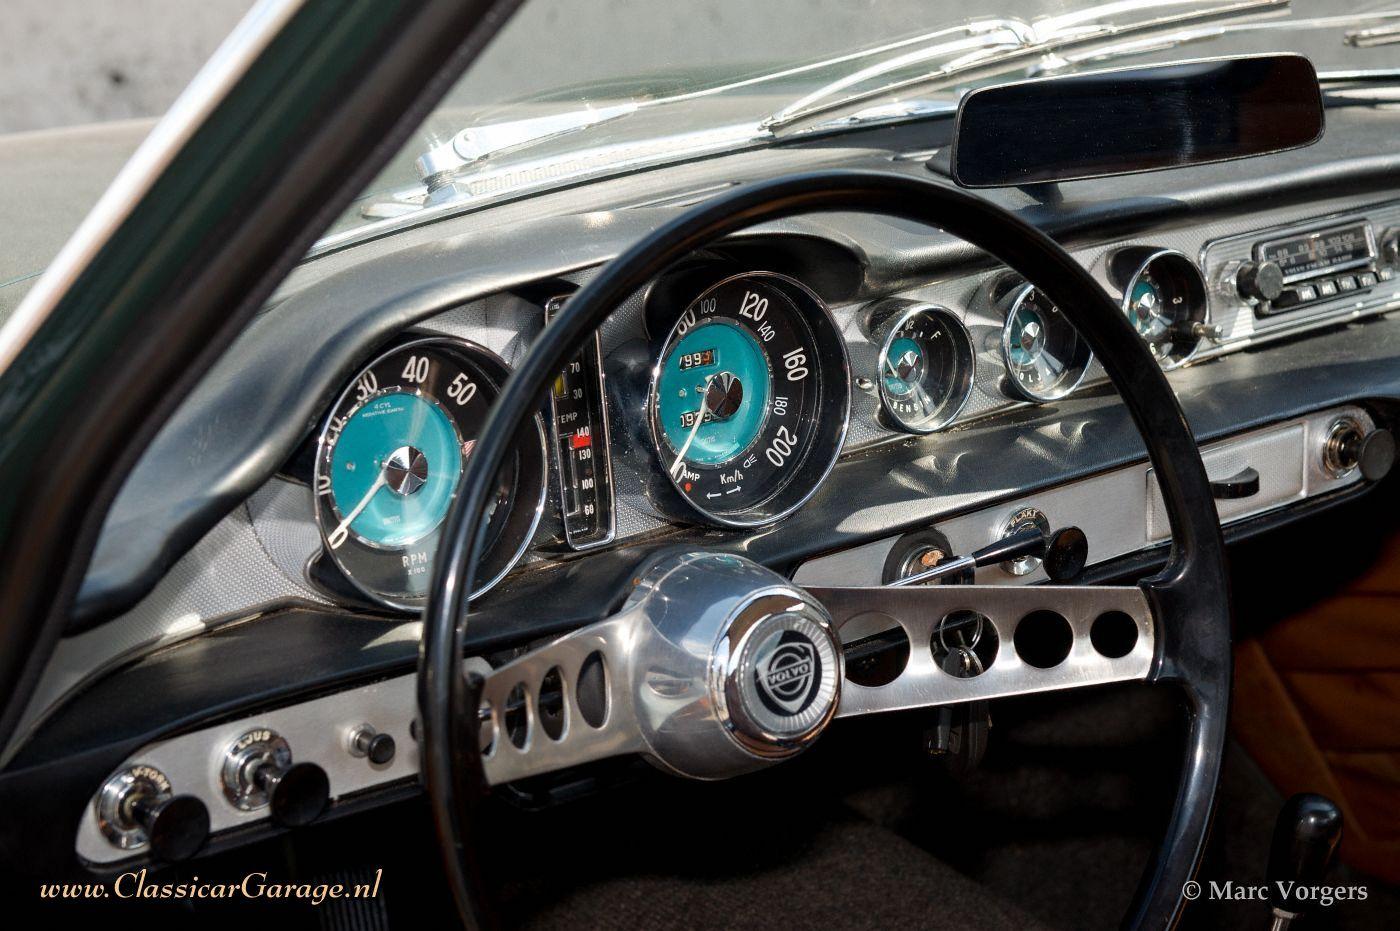 Guess The Car Dashboard At Night RealityCheckca - Cool car dashboards